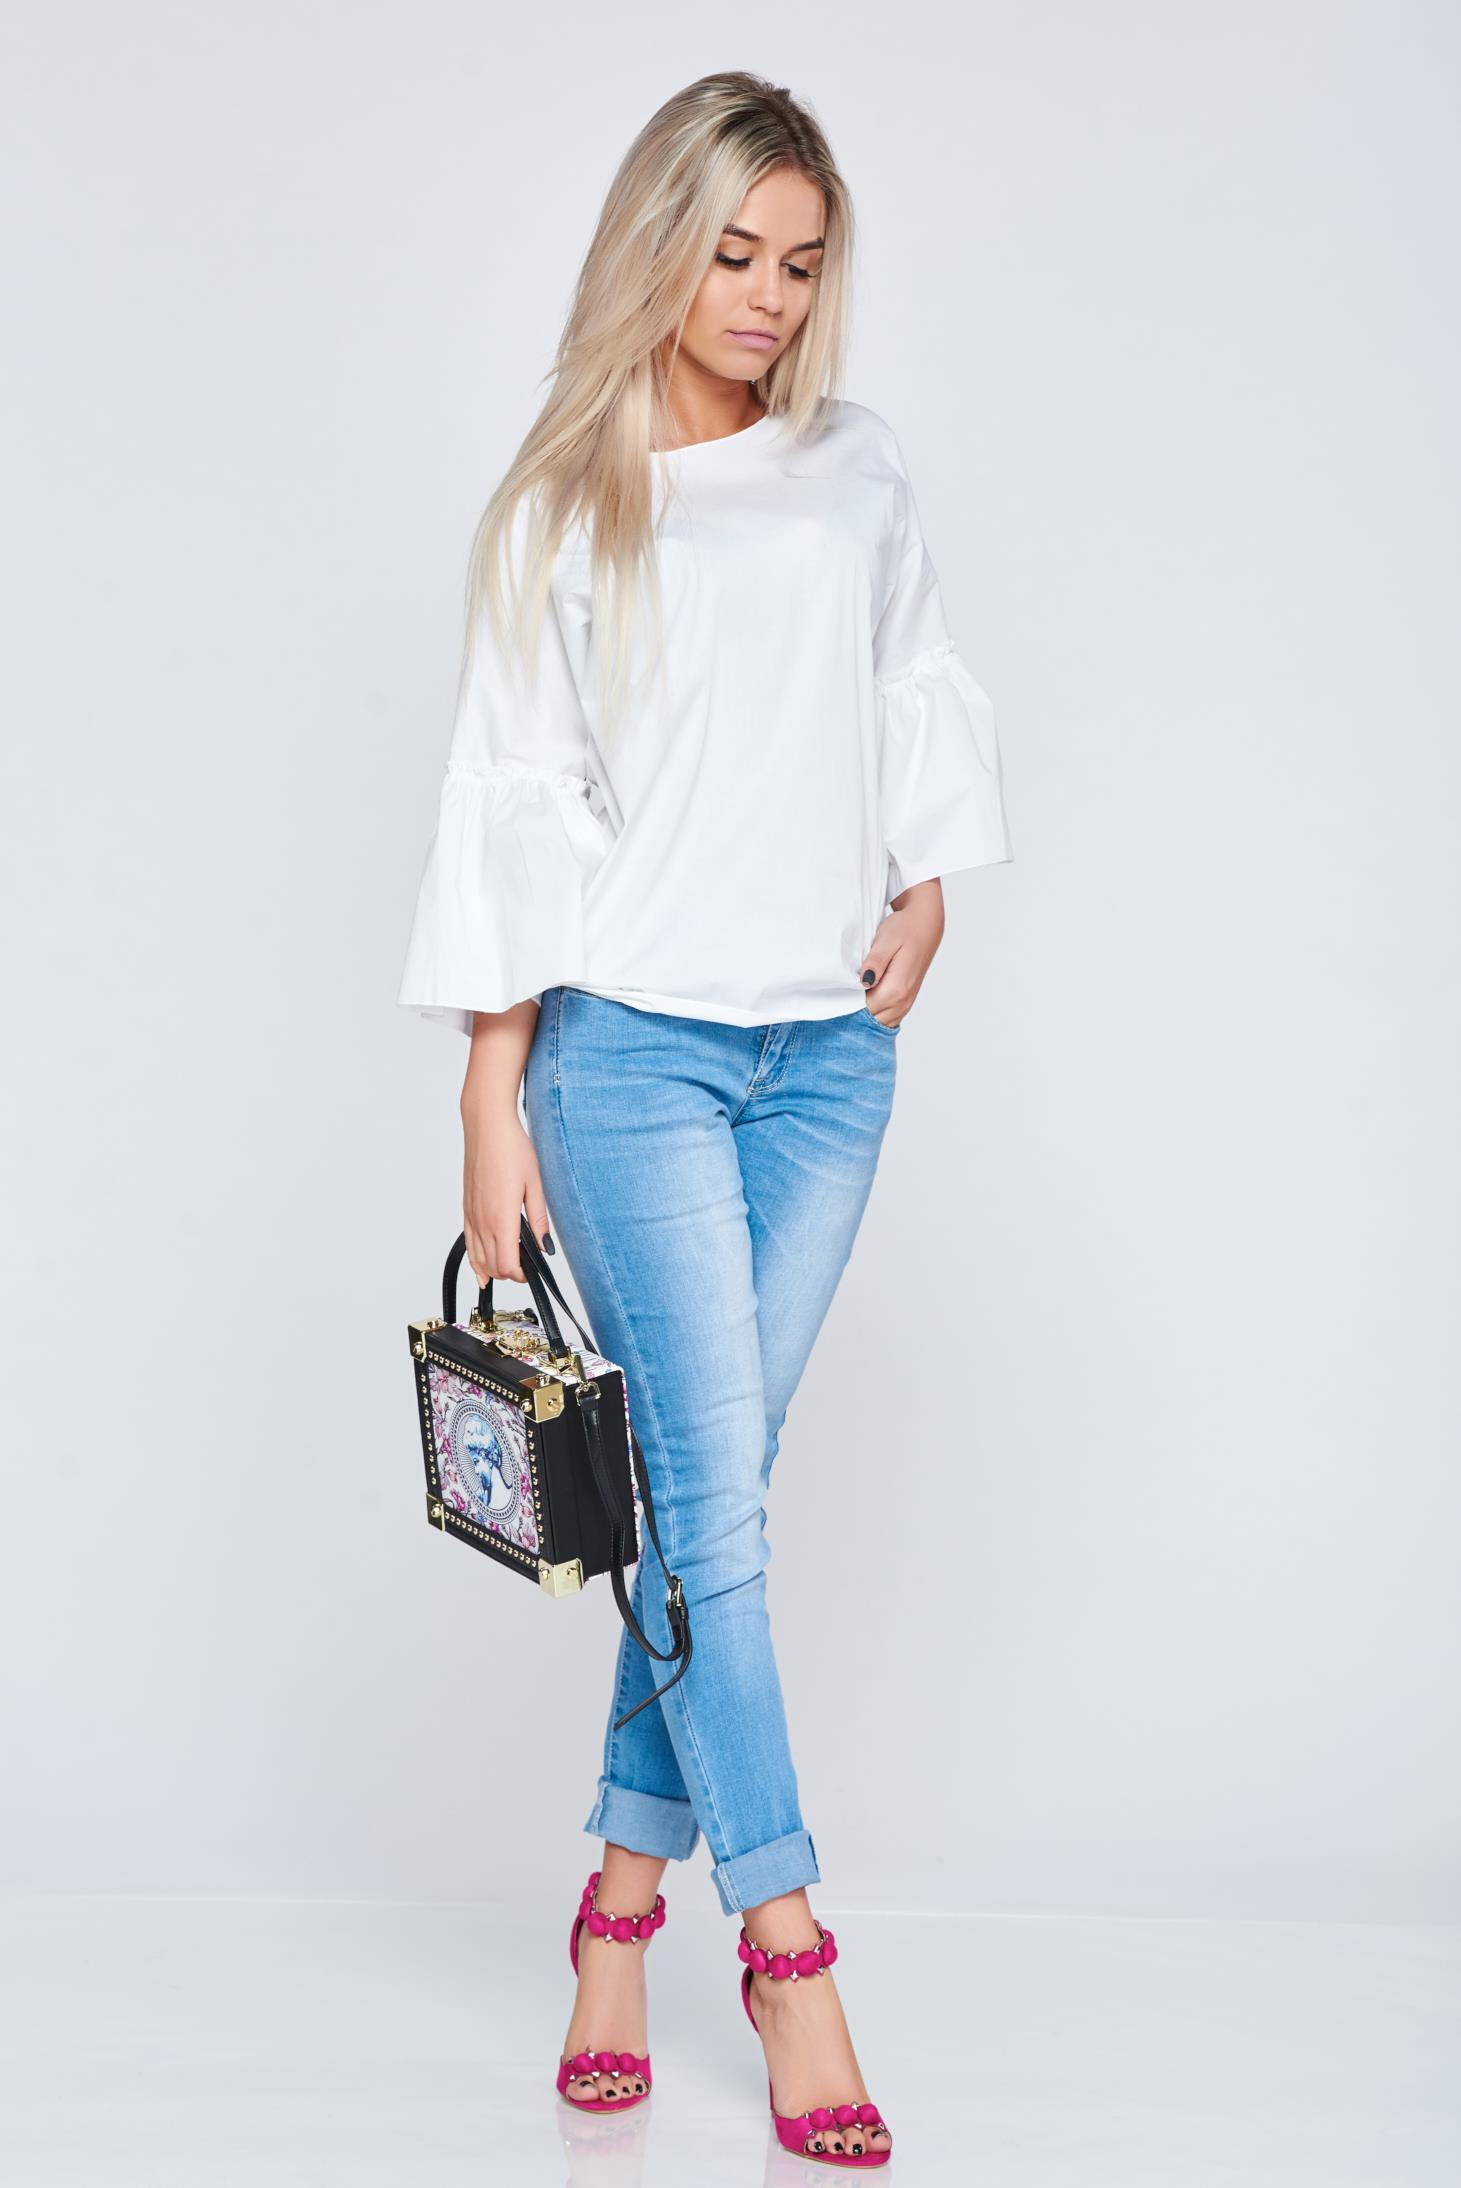 7b769d301c36f0 prettygirl-white-cotton-casual-women`s-blouse-with-S029998-1-293357.jpg